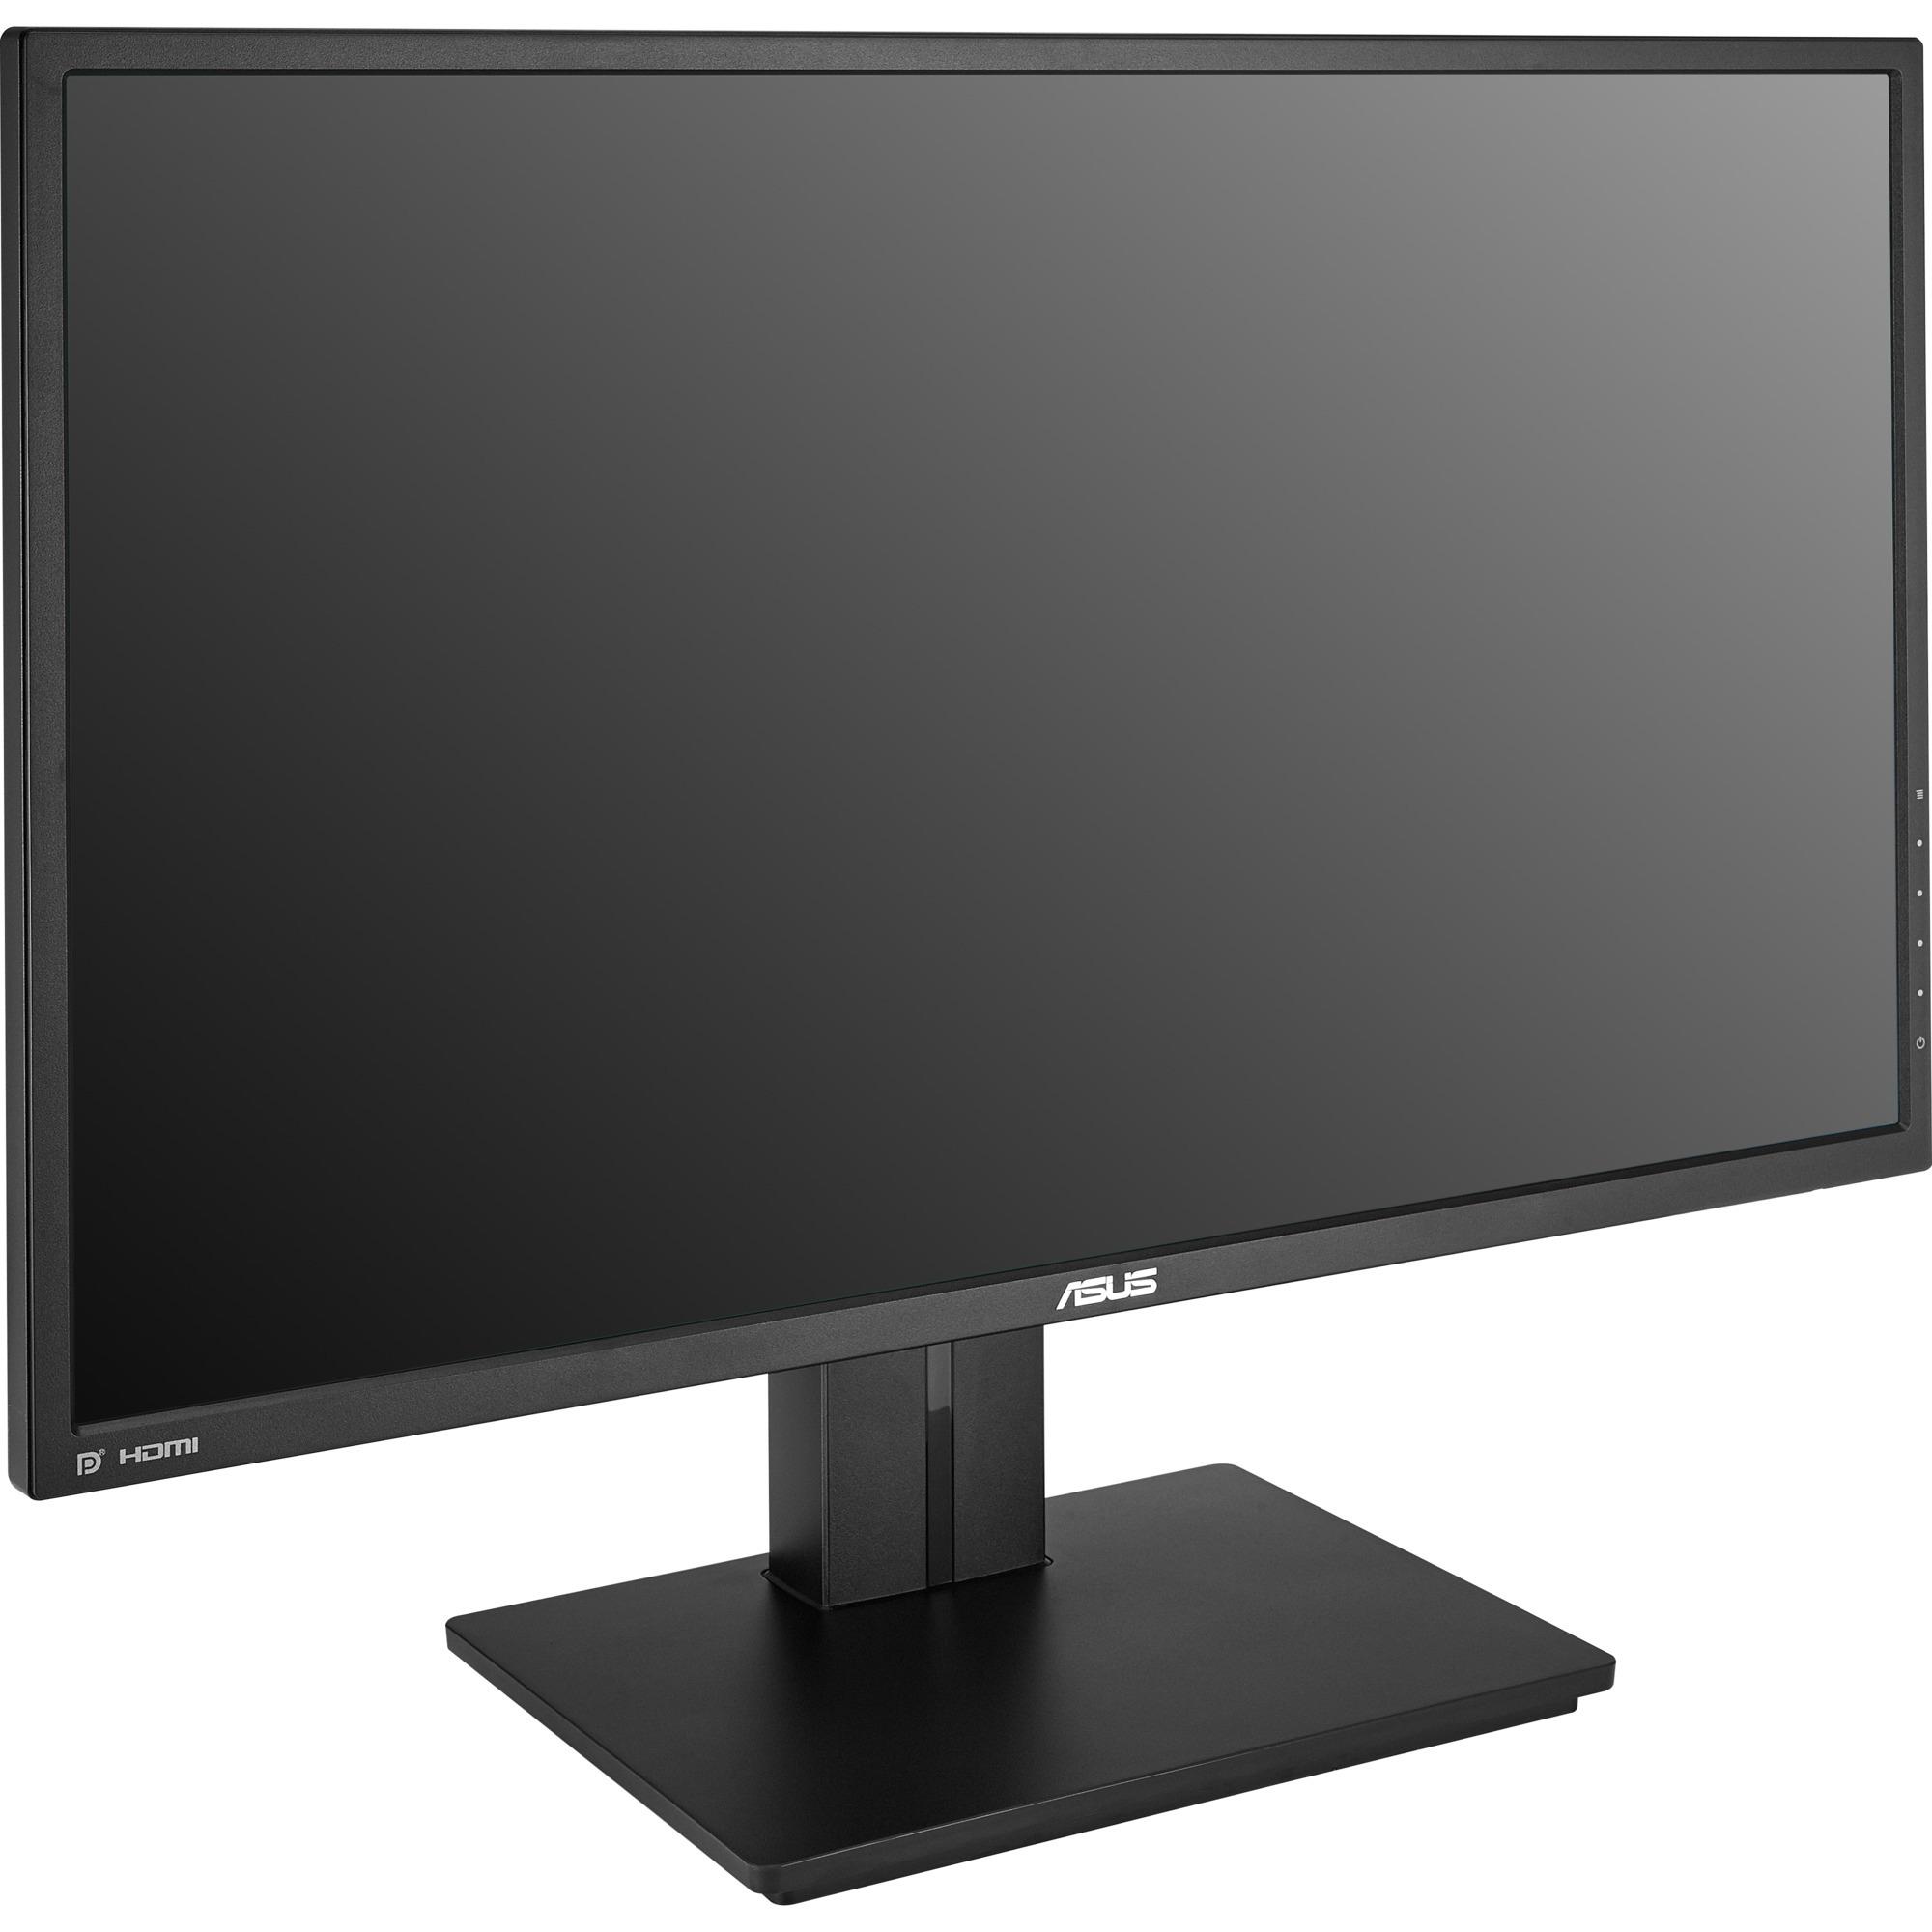 ASUS PB277Q, LED-Monitor schwarz, HDMI, DVI, DisplayPort, VGA, Pivot